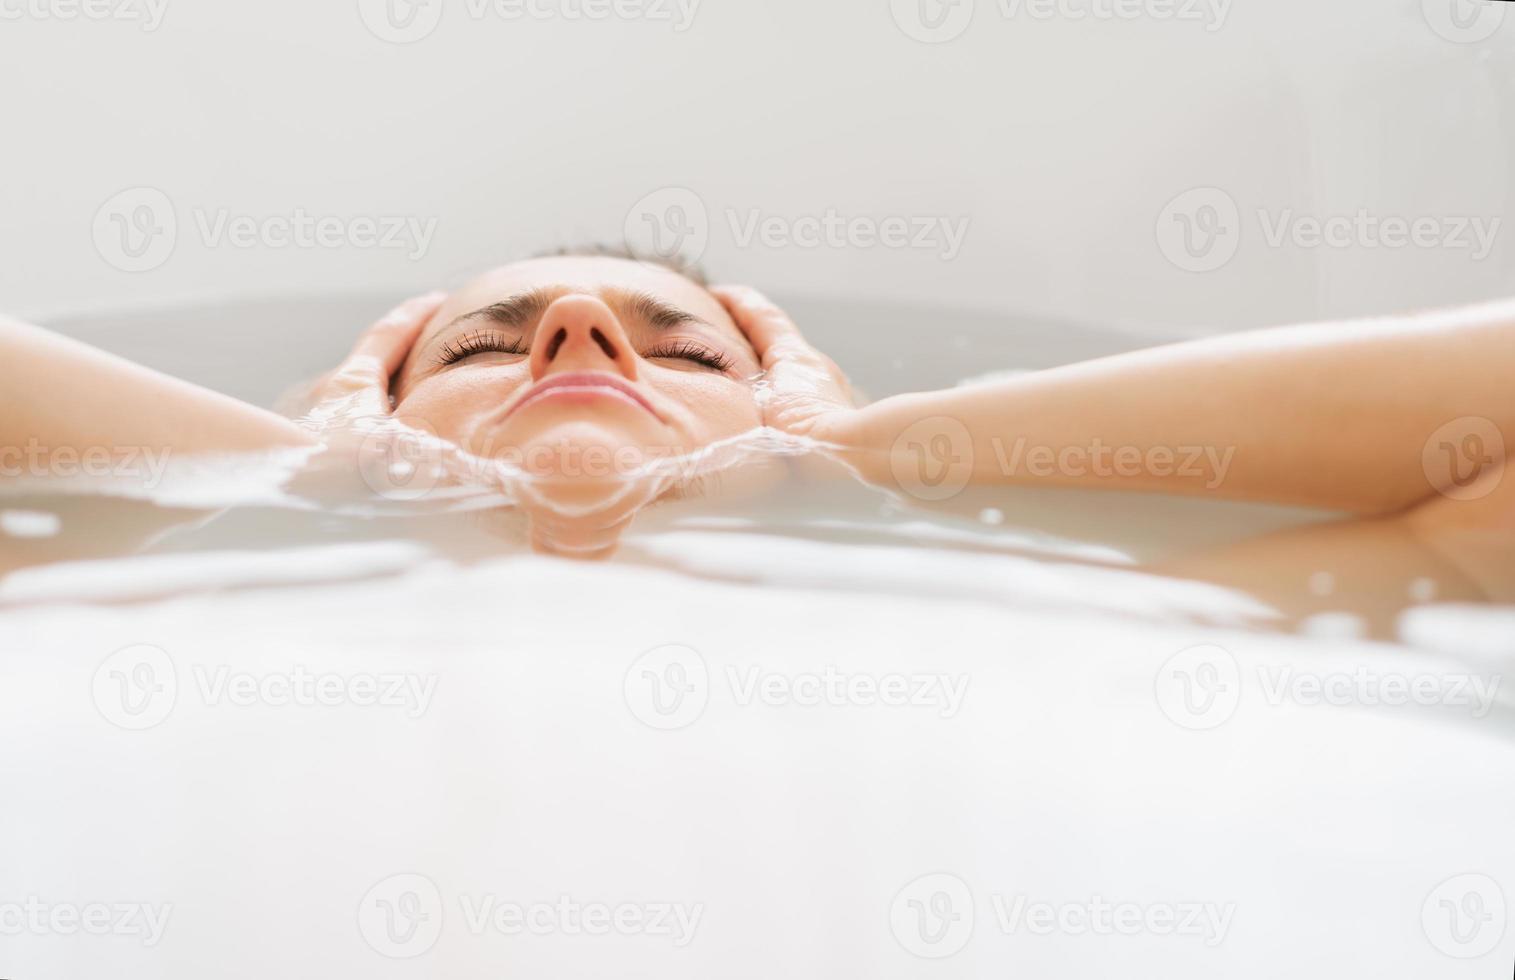 gestresste junge Frau in der Badewanne liegend foto